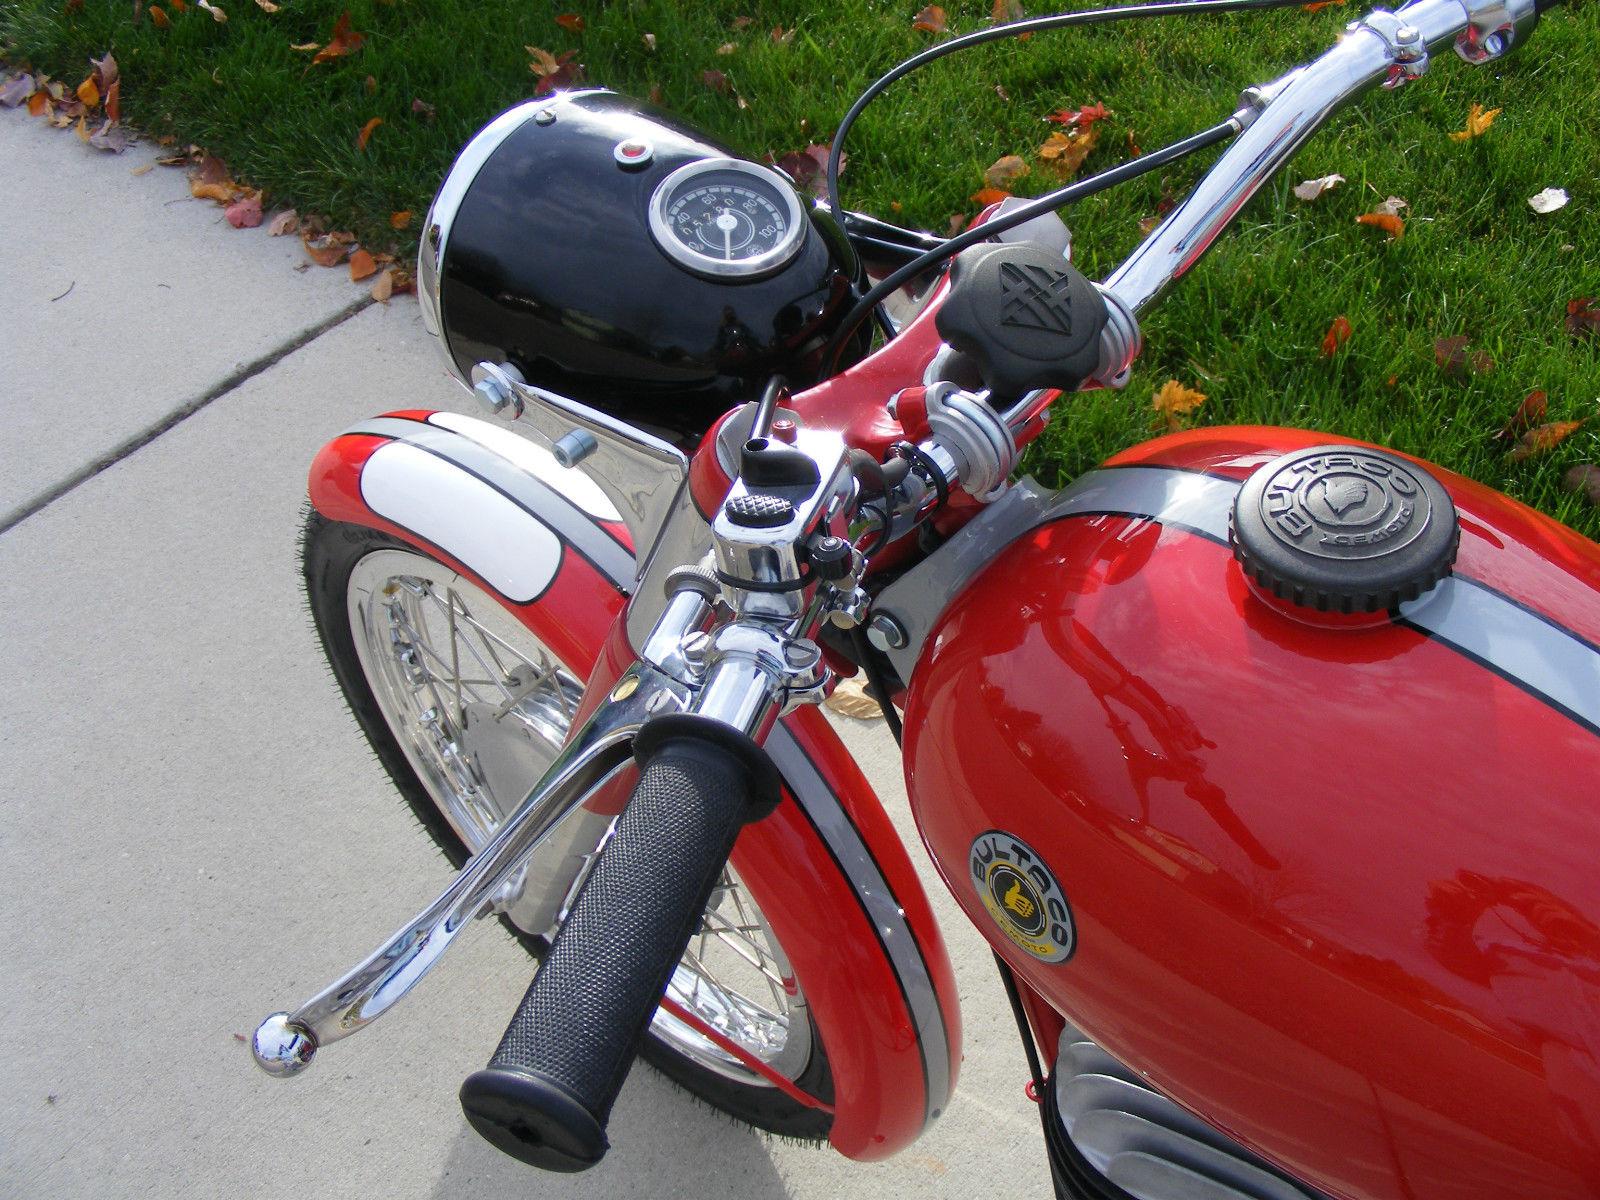 Bultaco Mercurio - 1966 - Handlebars and Grips.